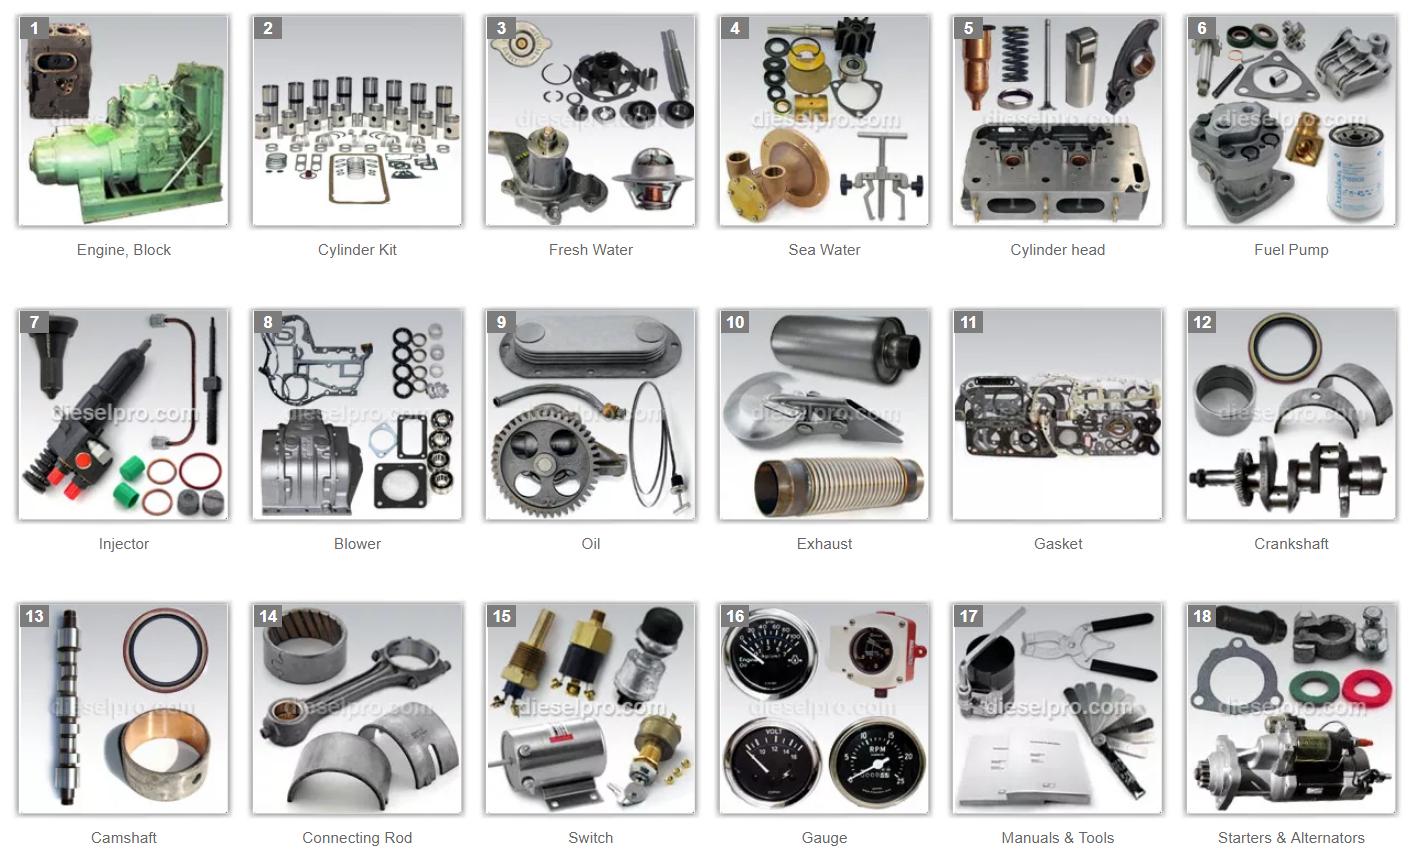 Diesel Pro Power Offers Premier Place to Buy Detroit Diesel Engine